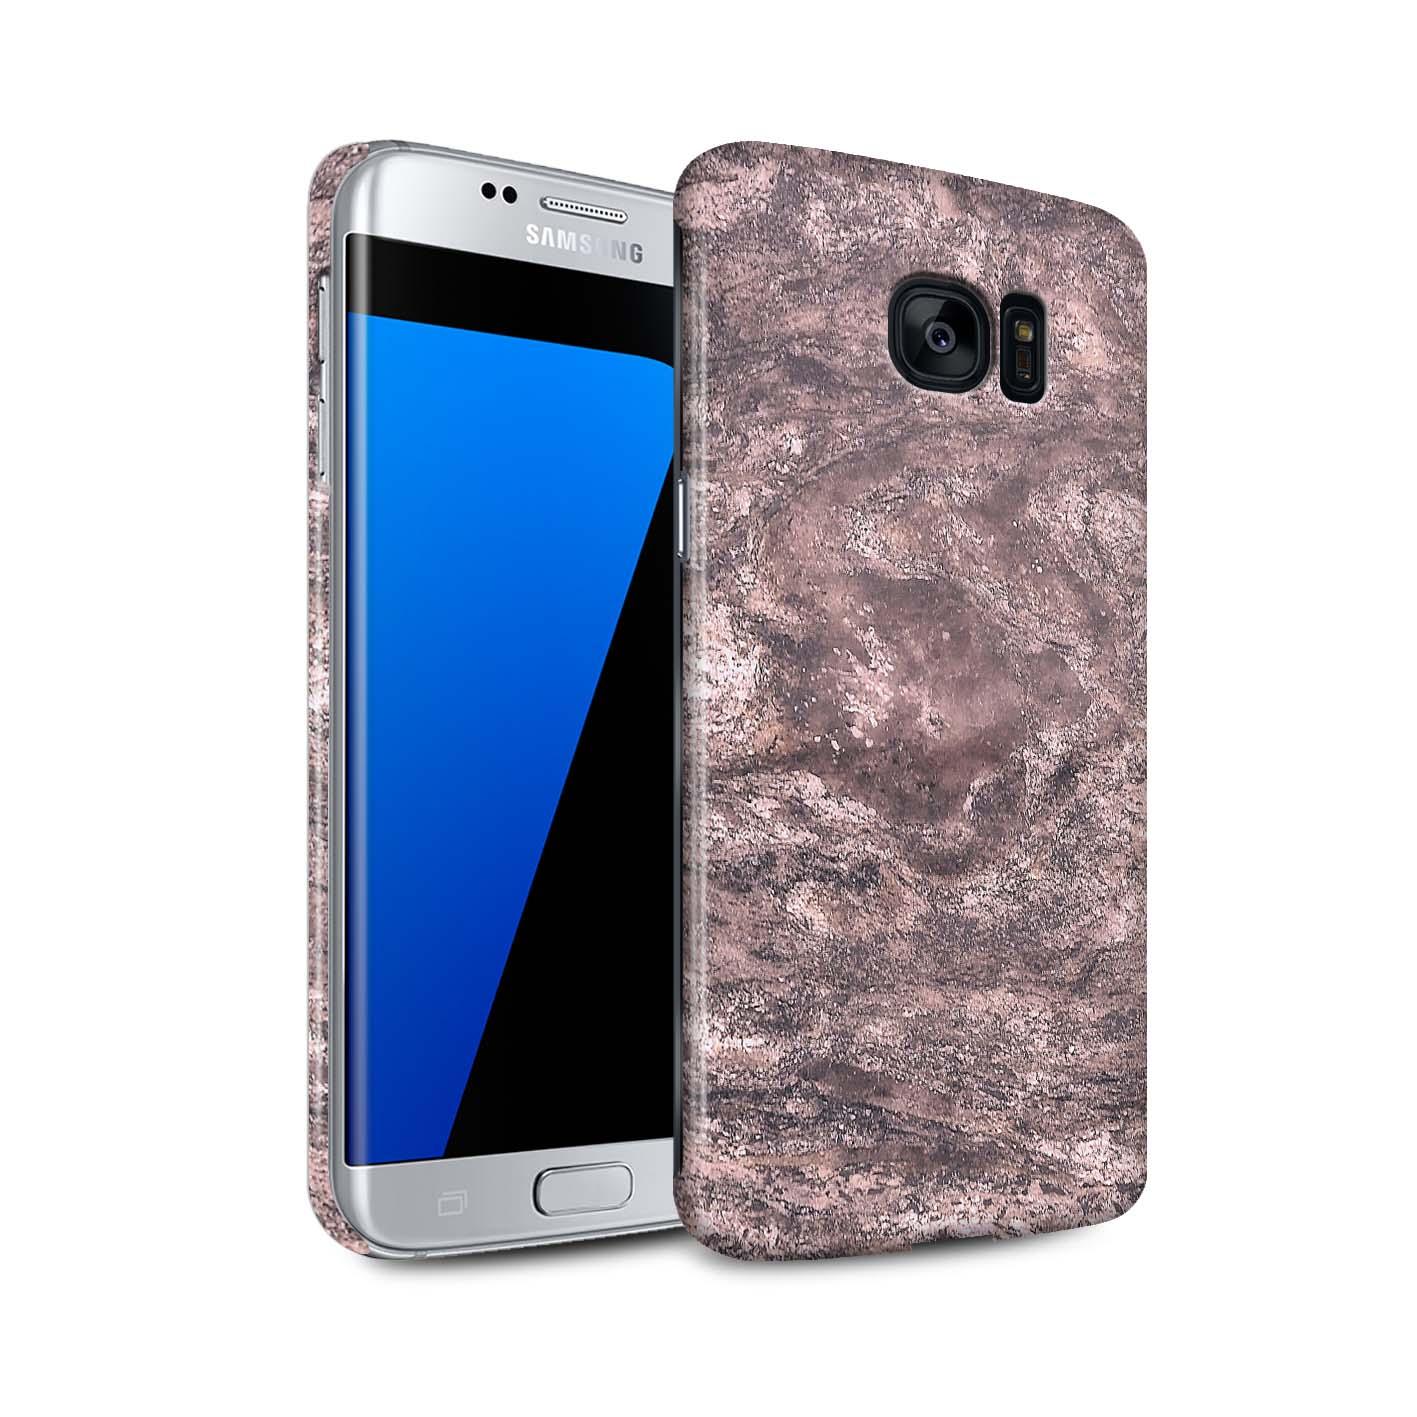 Coque-Etui-Brillant-de-STUFF4-pour-Samsung-Galaxy-S7-Edge-G935-Mode-Rose